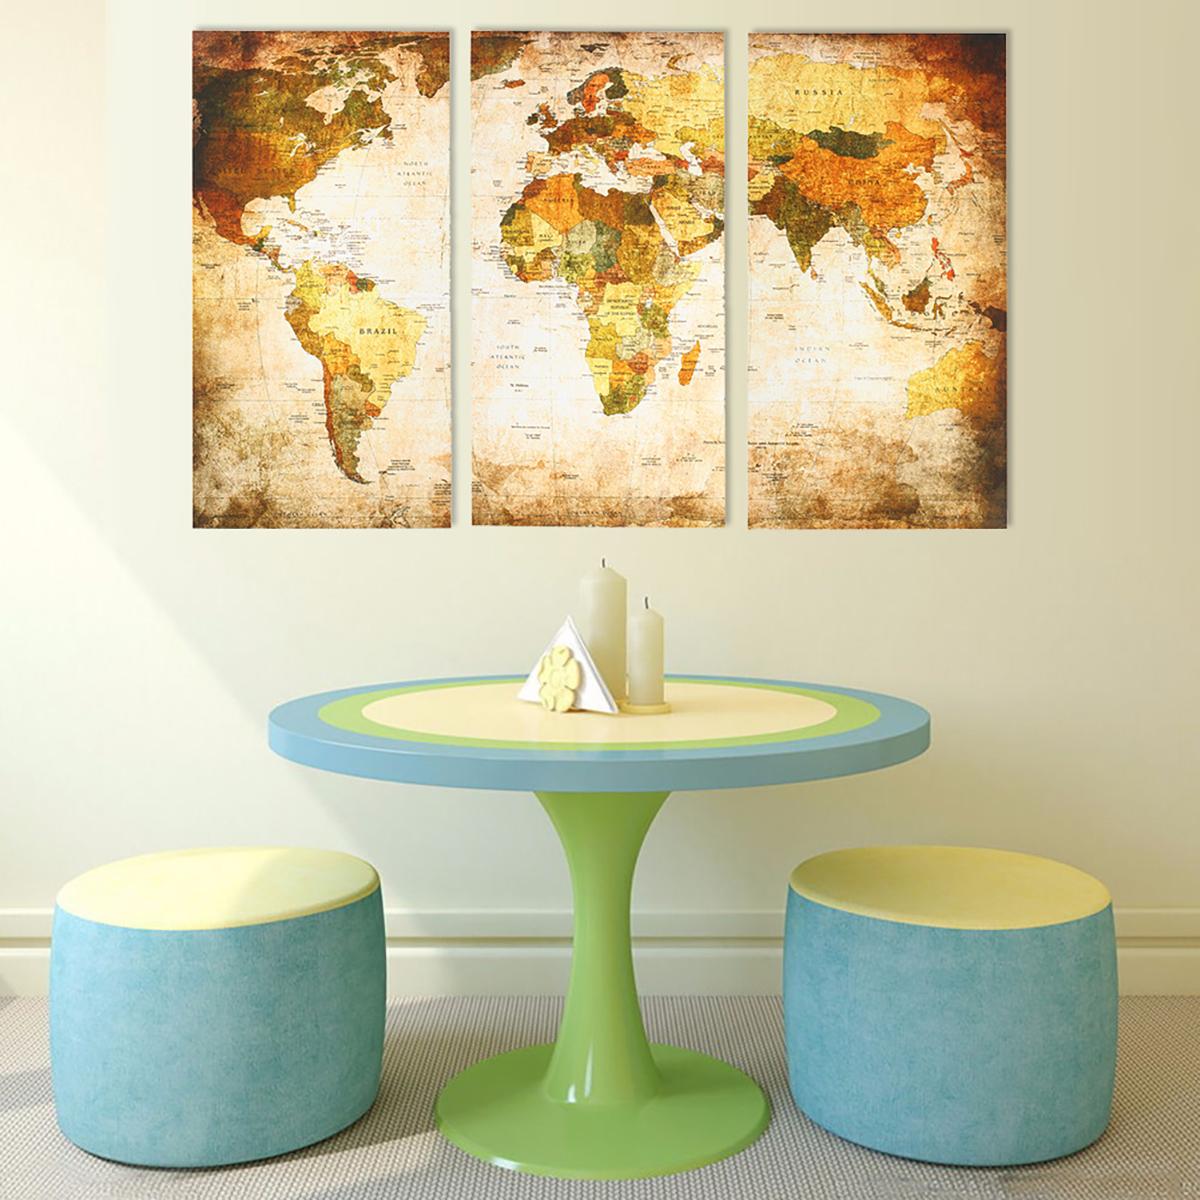 3Pcs Framed Home Decor Canvas Print Painting Wall Art Classic World ...